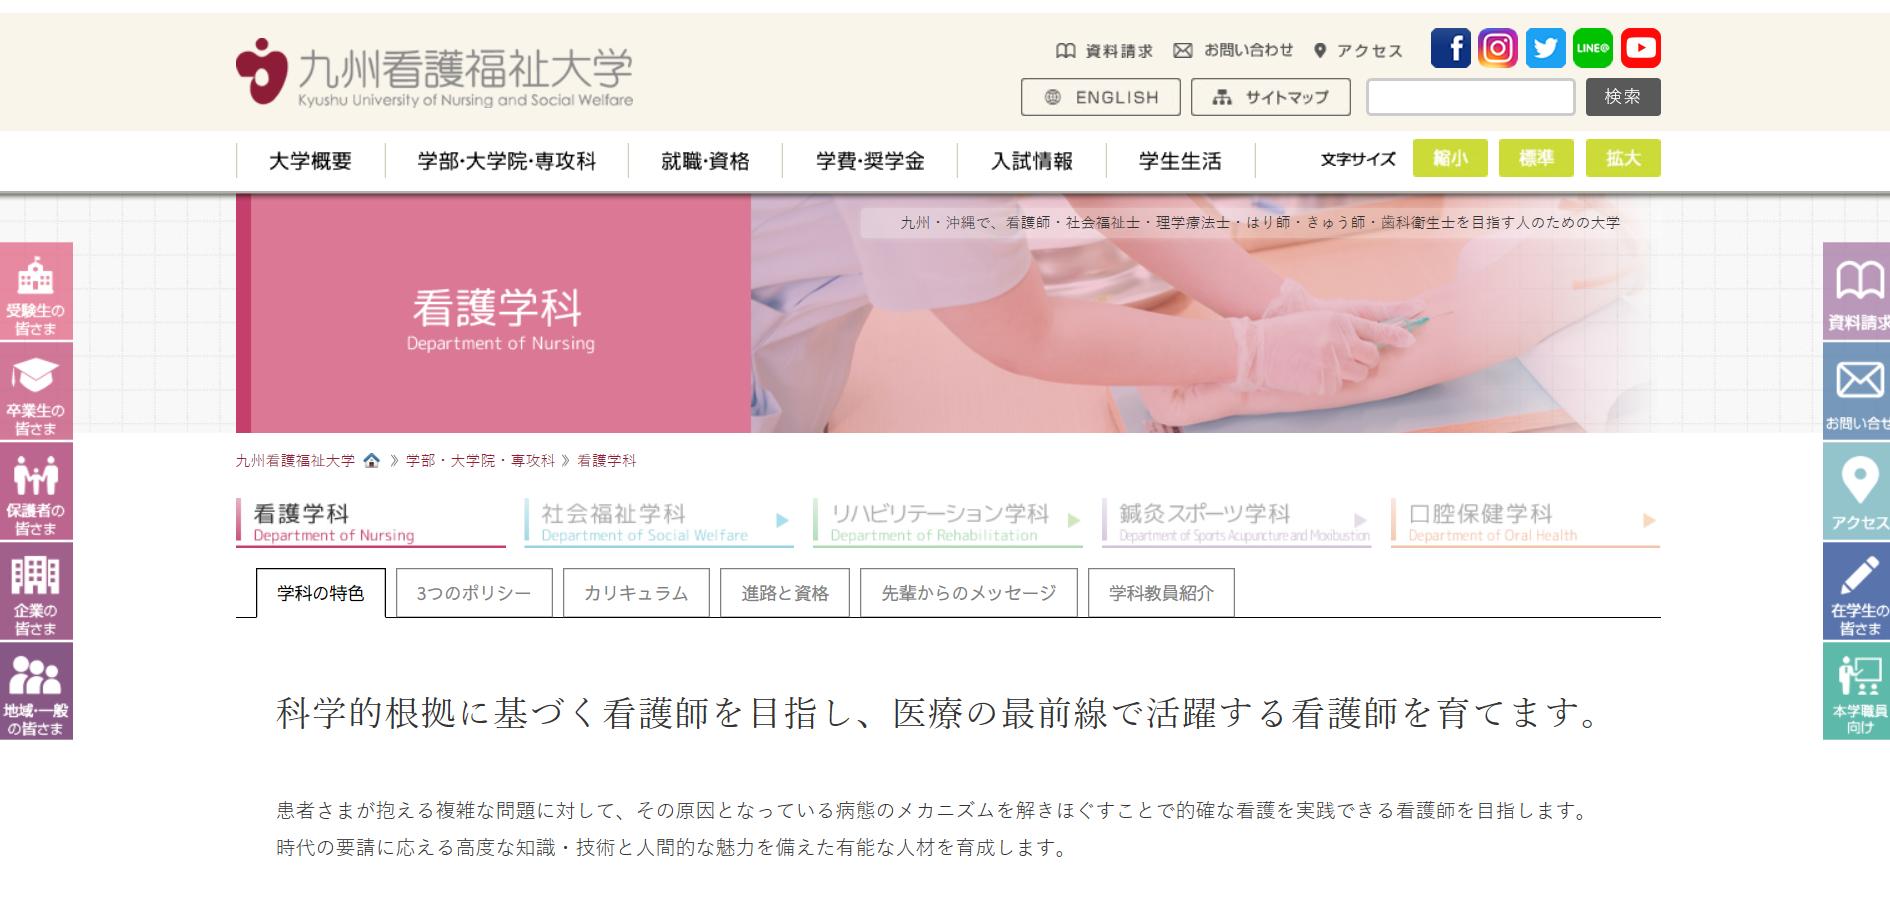 九州看護福祉大学の評判・口コミ【看護福祉学部編】